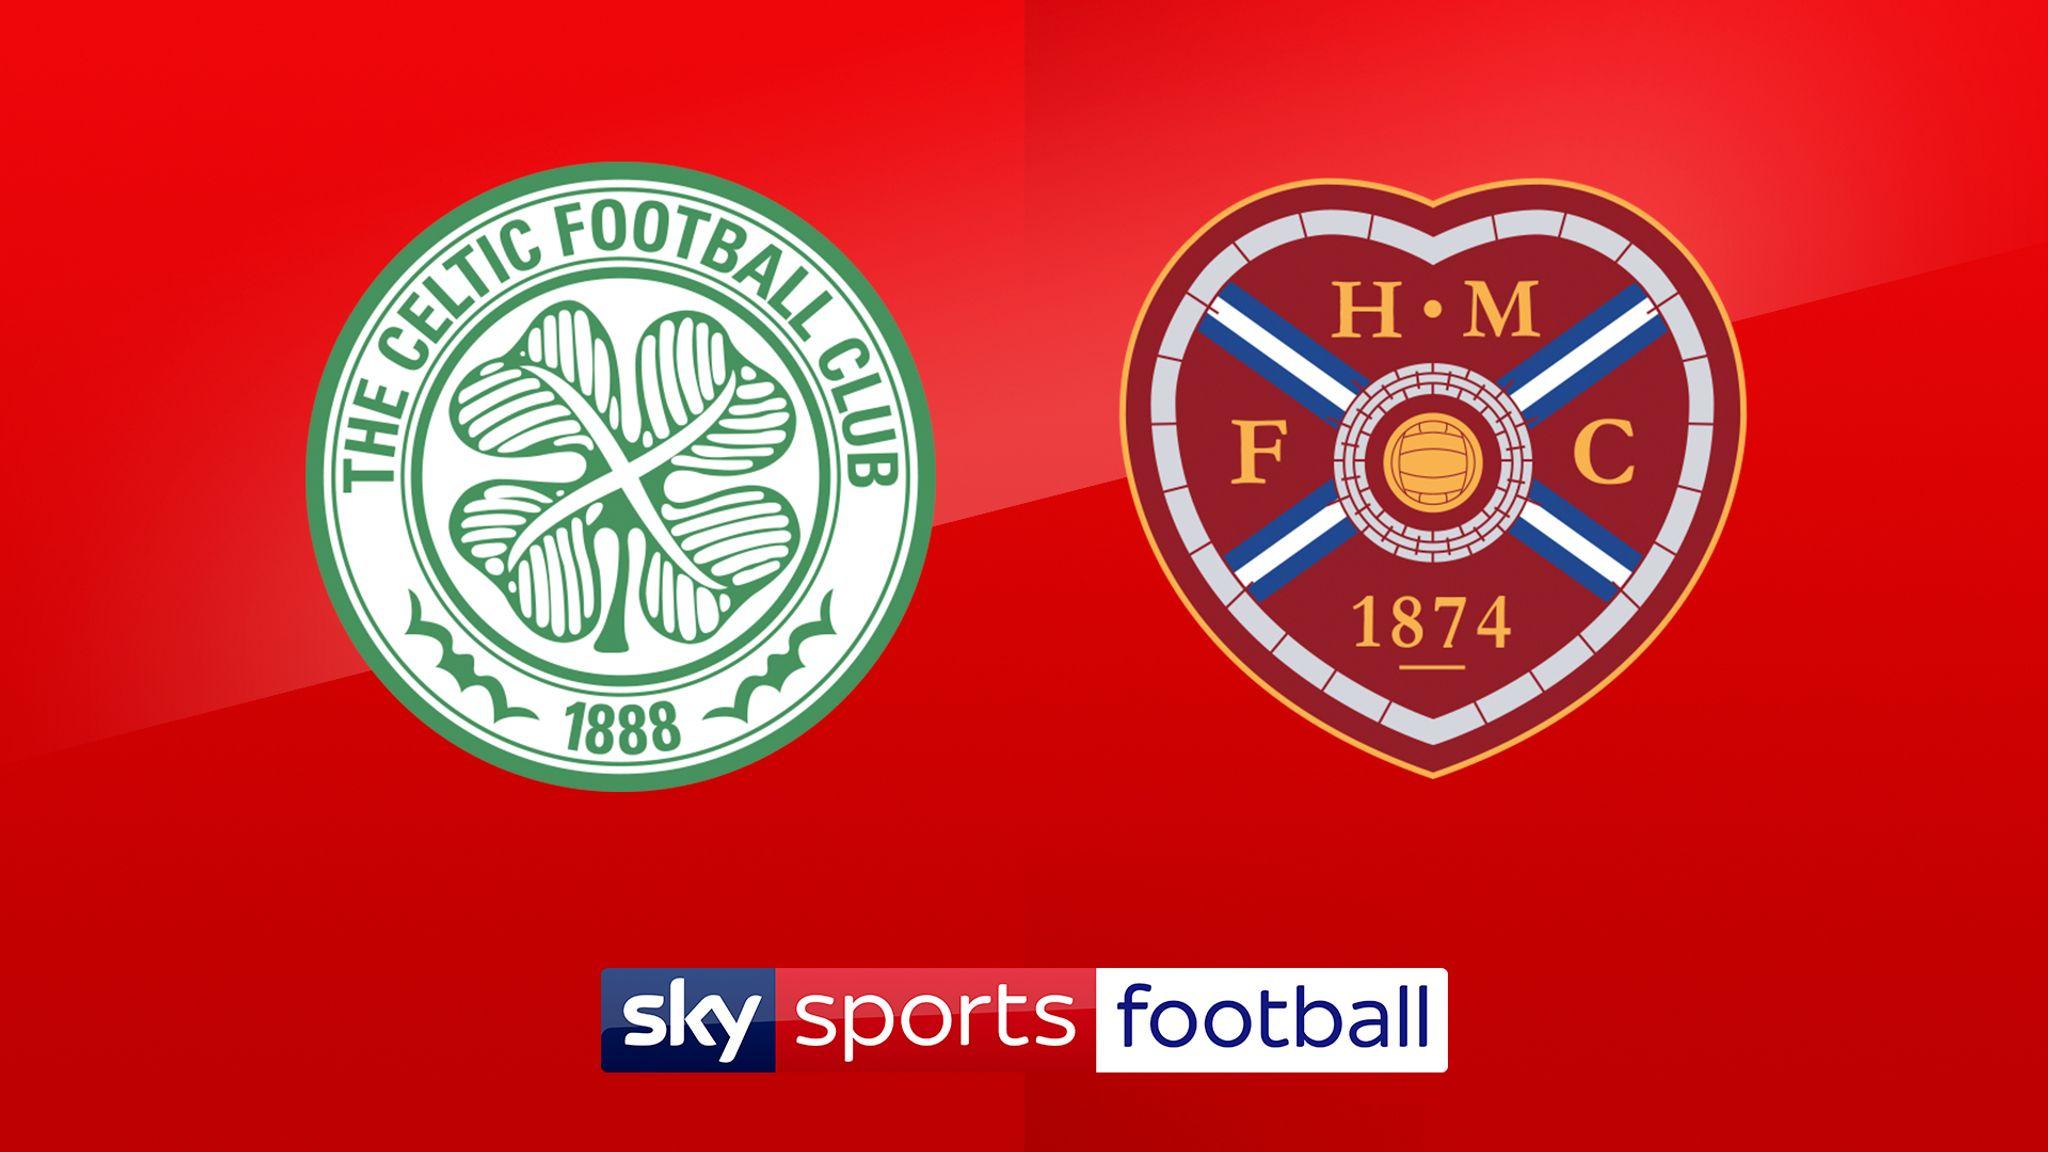 FIFA 20 - Celtic Glasgow, You 'll never walk alone ! - Page 5 Skysports-celtic-hearts-scottish-premiership_4662679